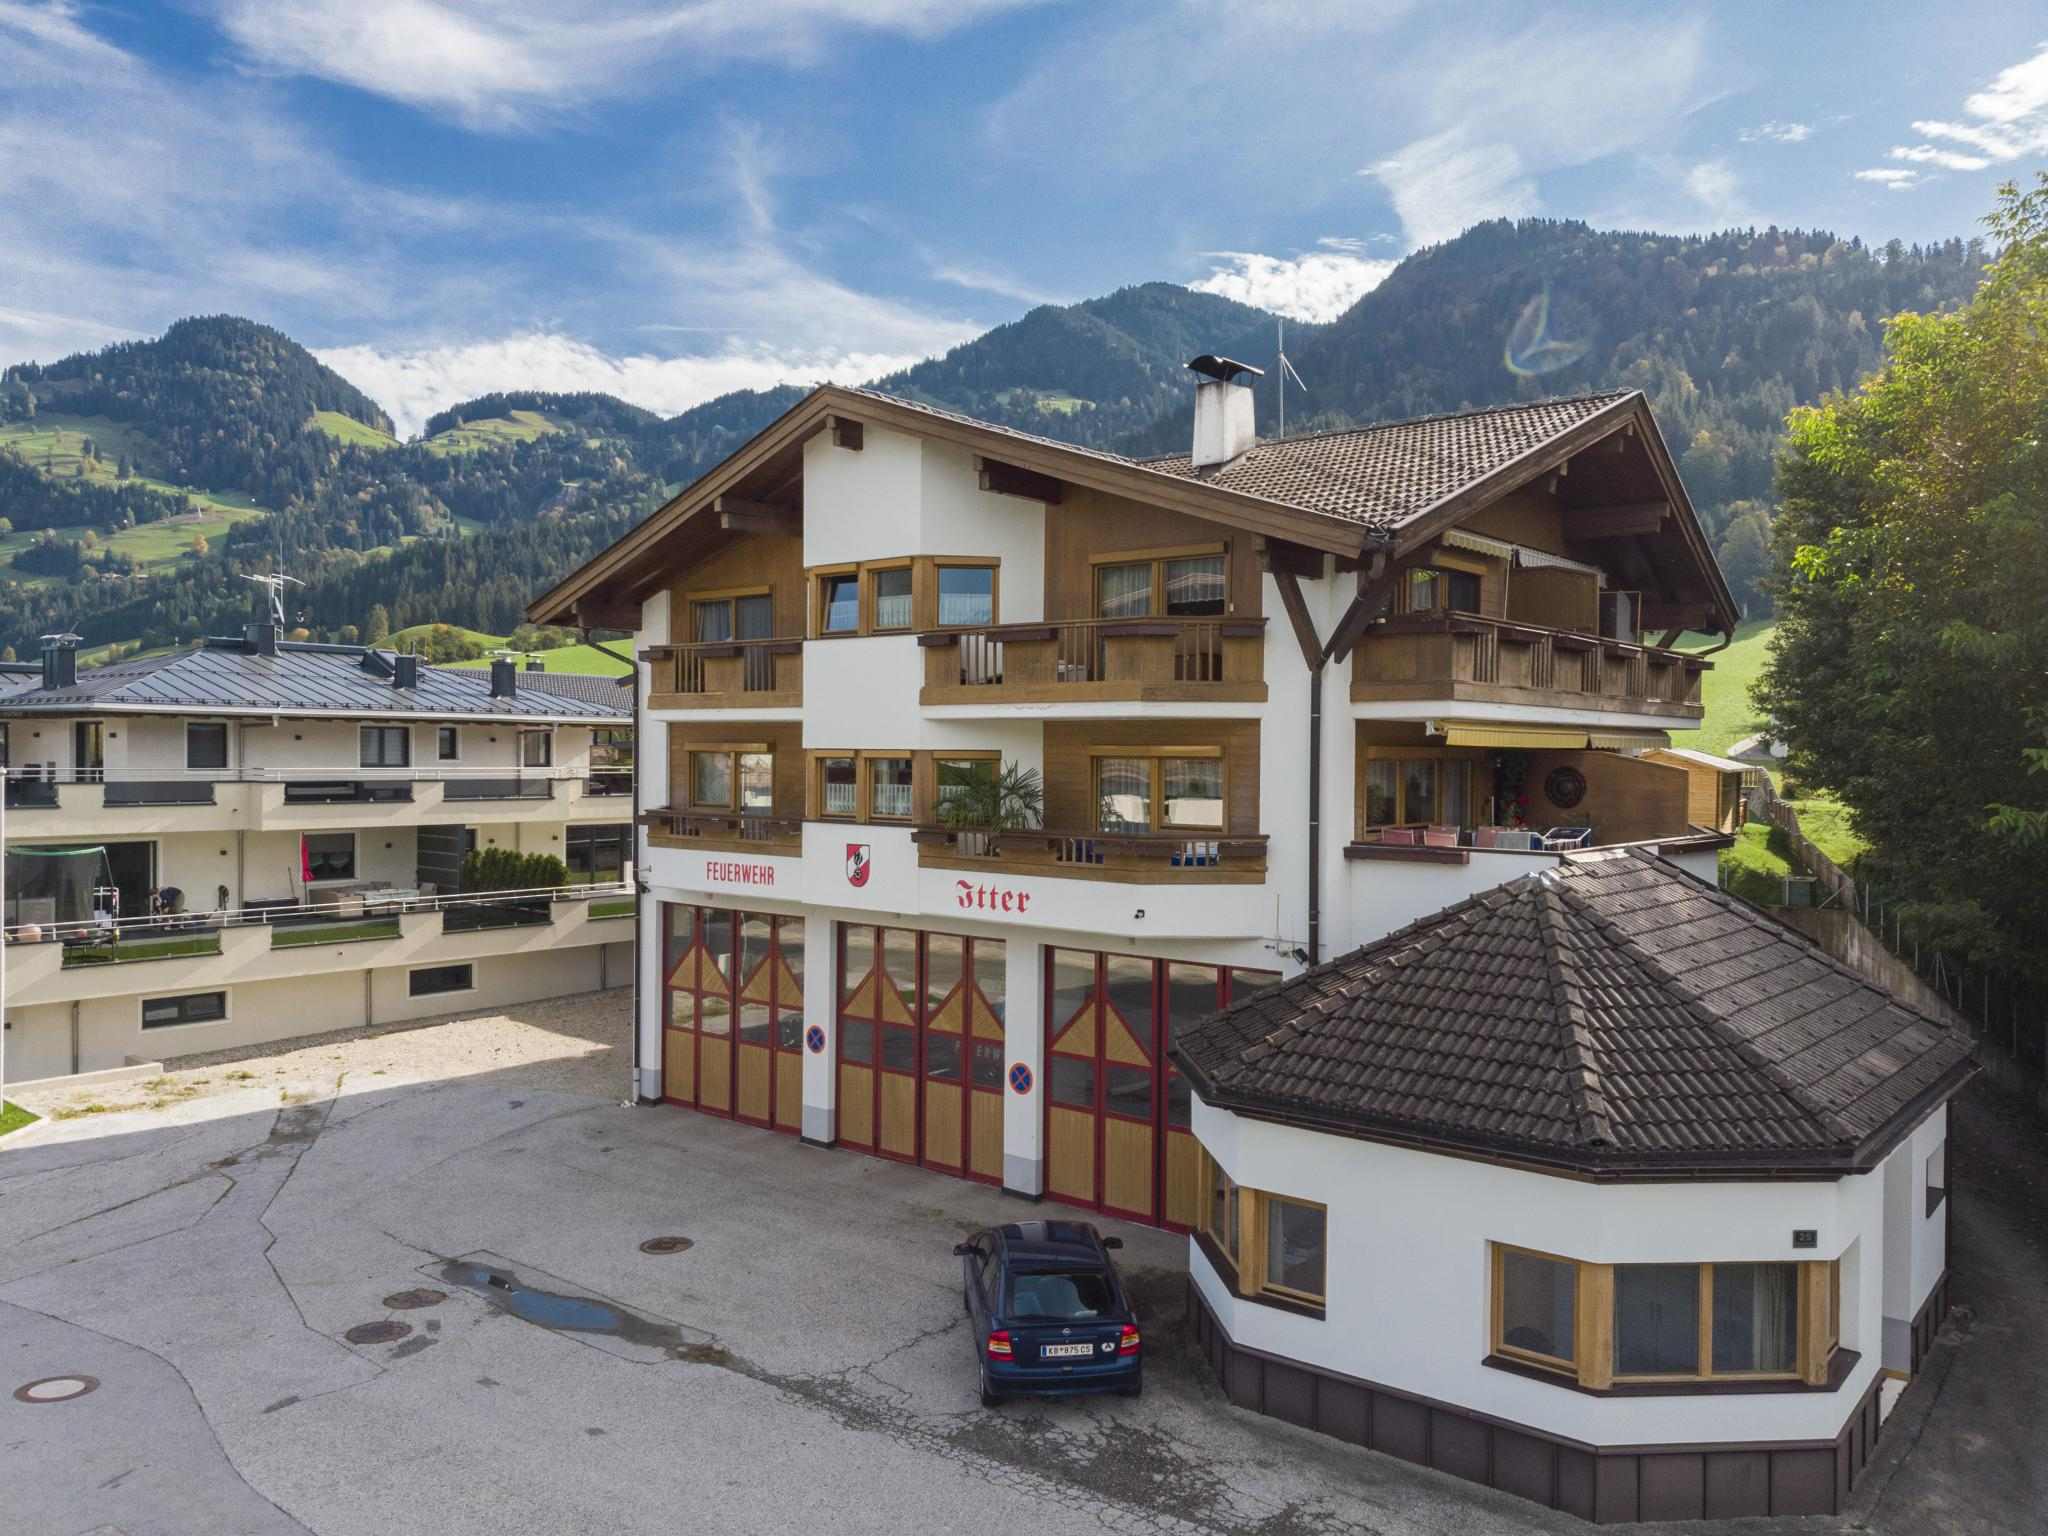 Itterblick Tirol